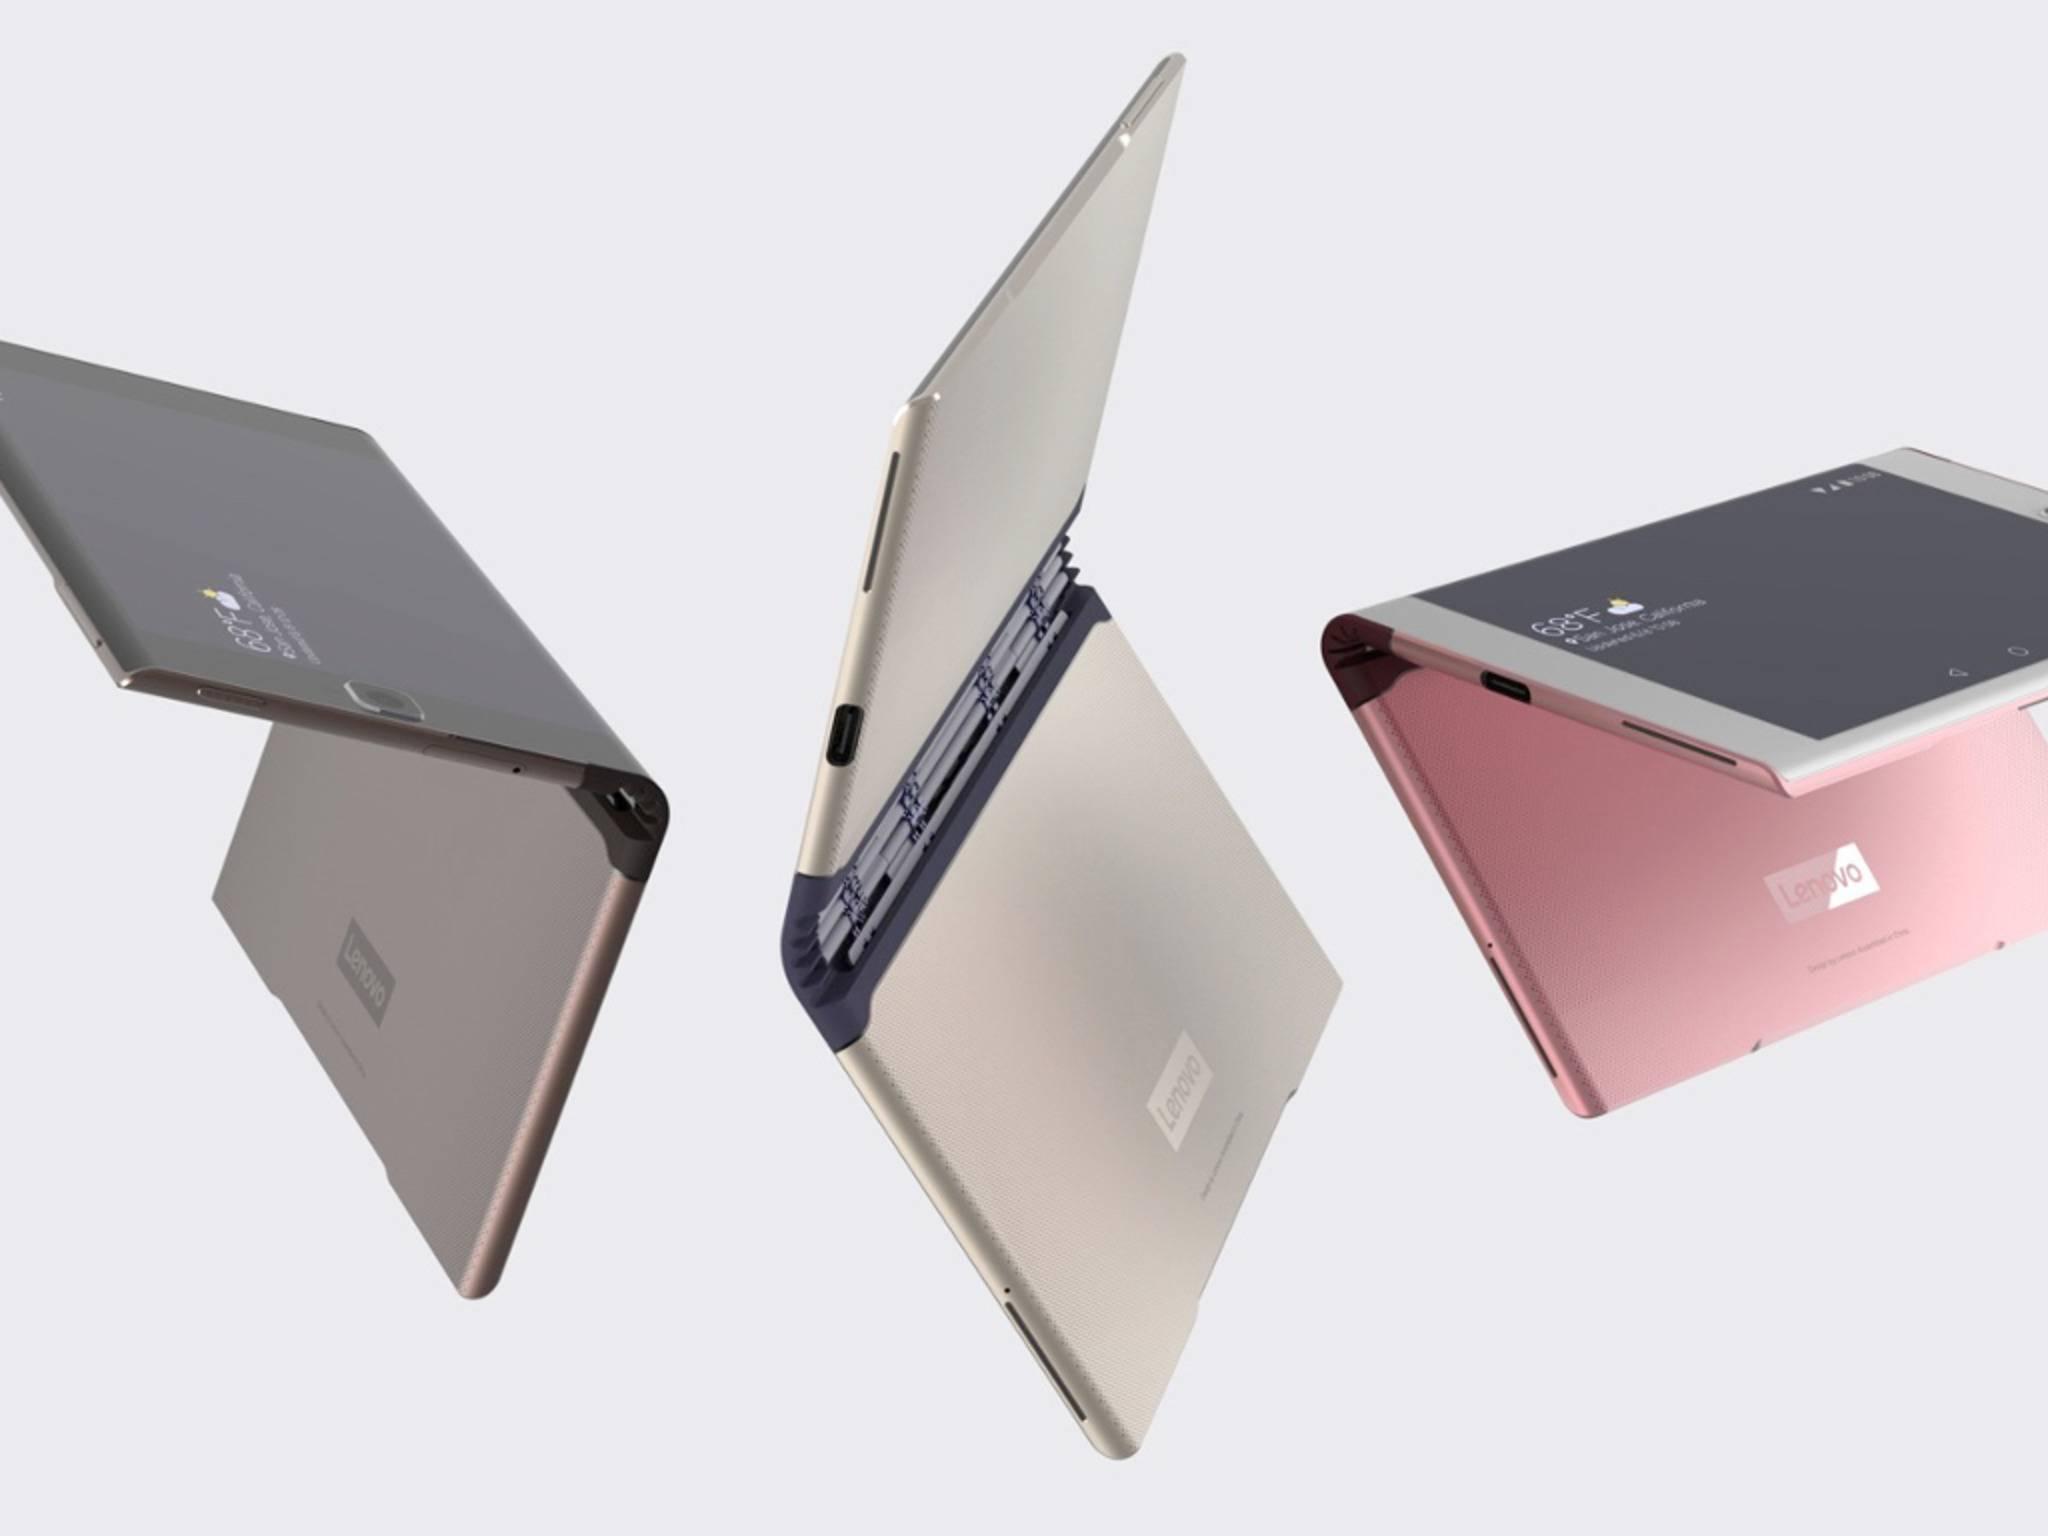 Lenovo Flex Tablet 2